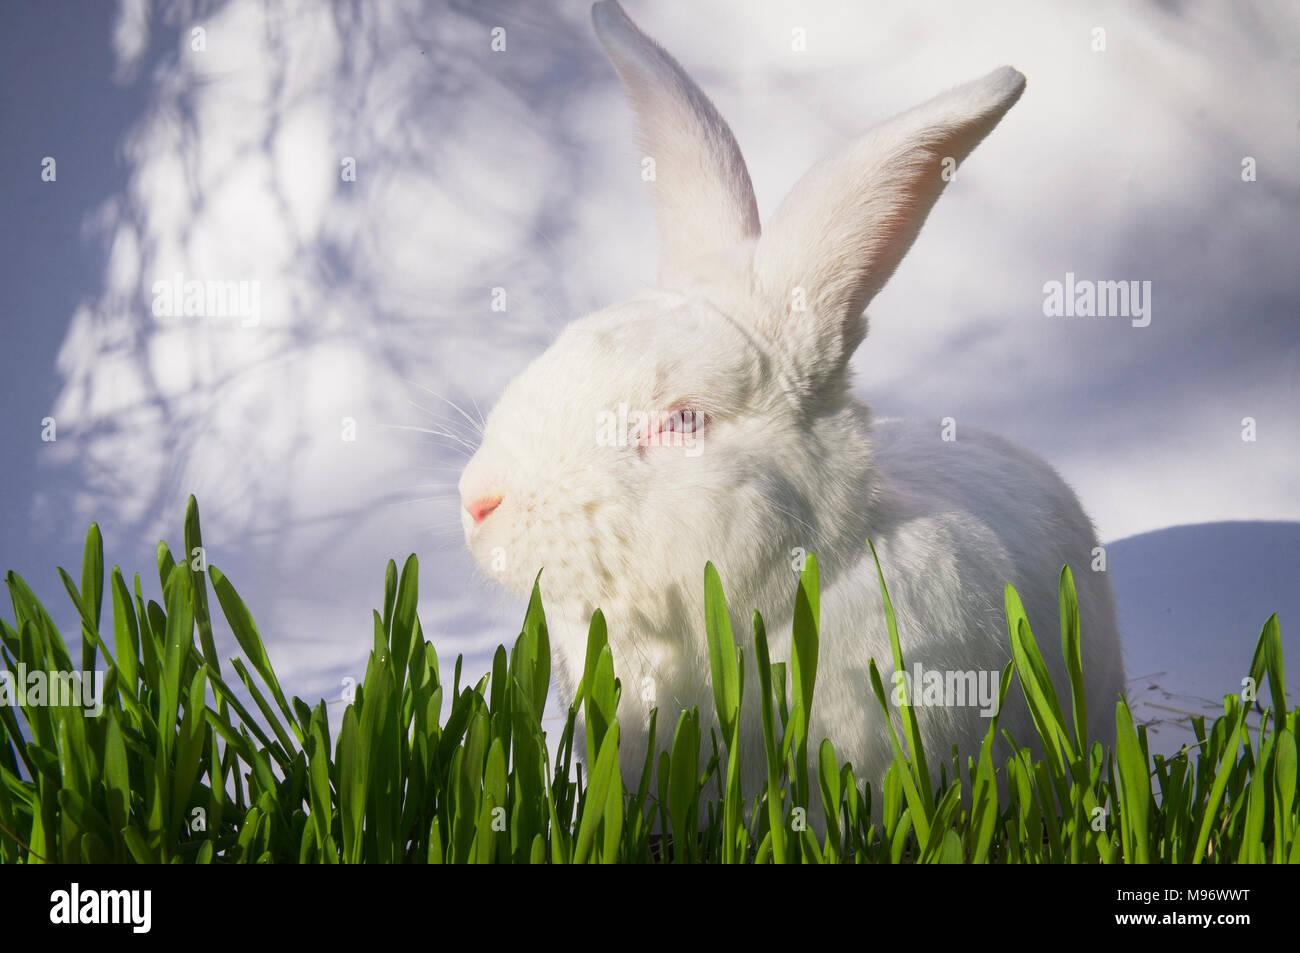 Ostern Bunny Hase Weiss Grun Gras Saen Dekoration Abbildung